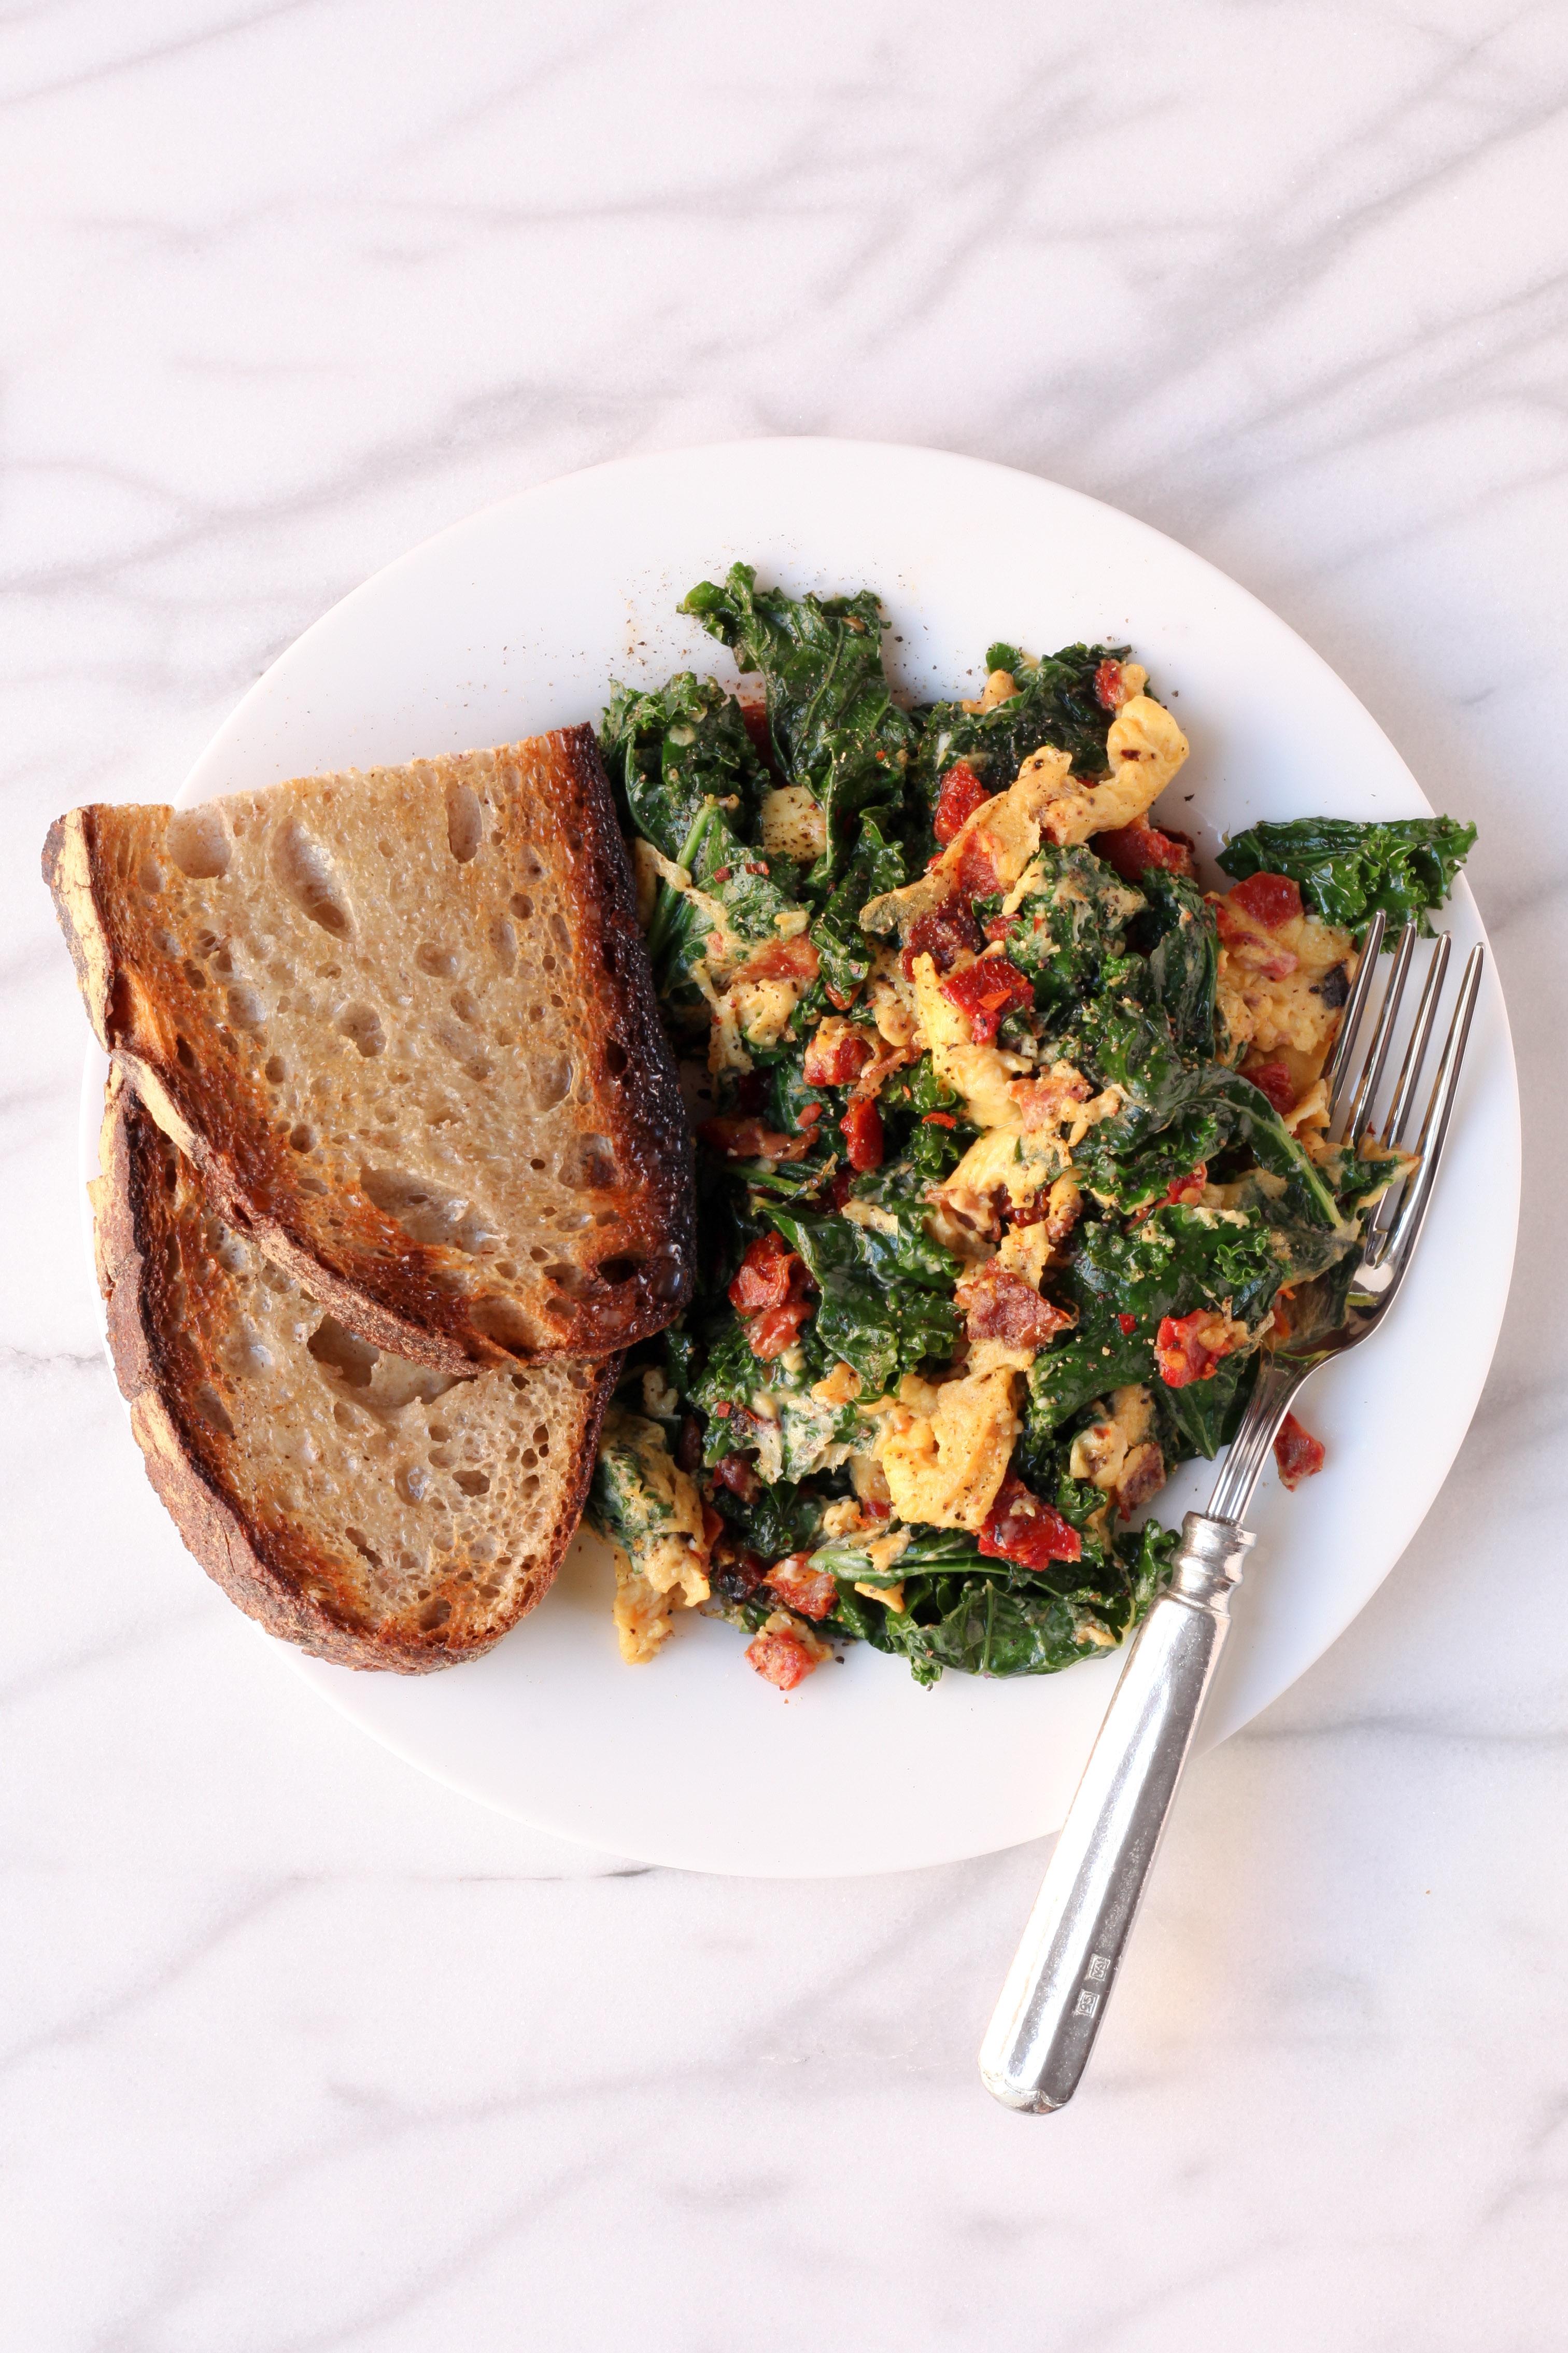 Kale, Pancetta, and Sundried Tomato Scramble | amodestfeast.com | @amodestfeast